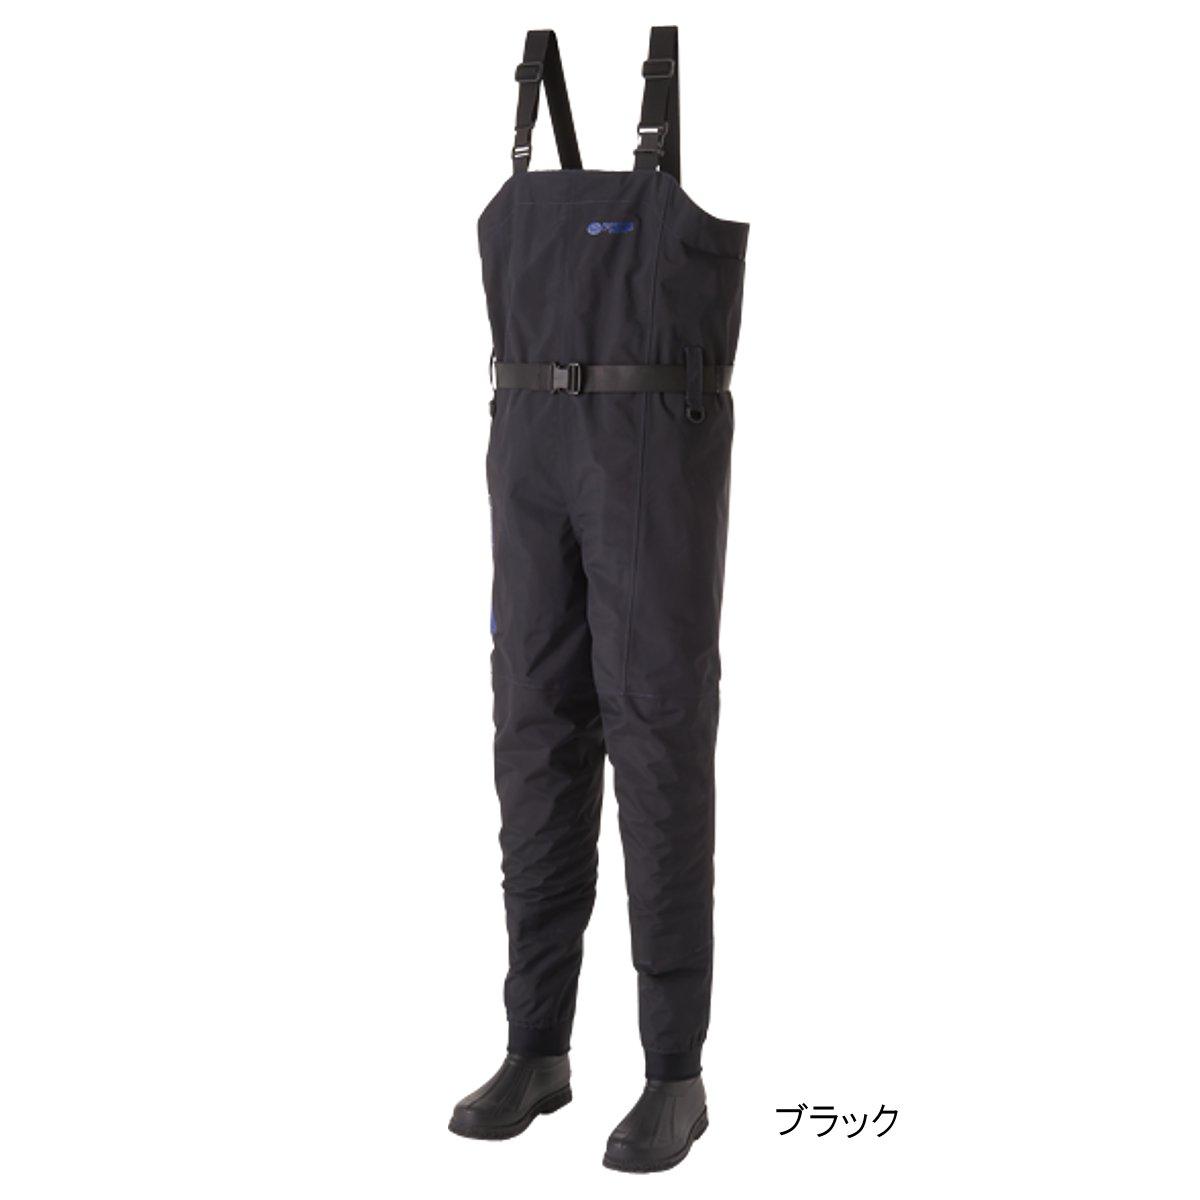 RBB タイドウォーカーIII No.8784 LL ブラック【送料無料】